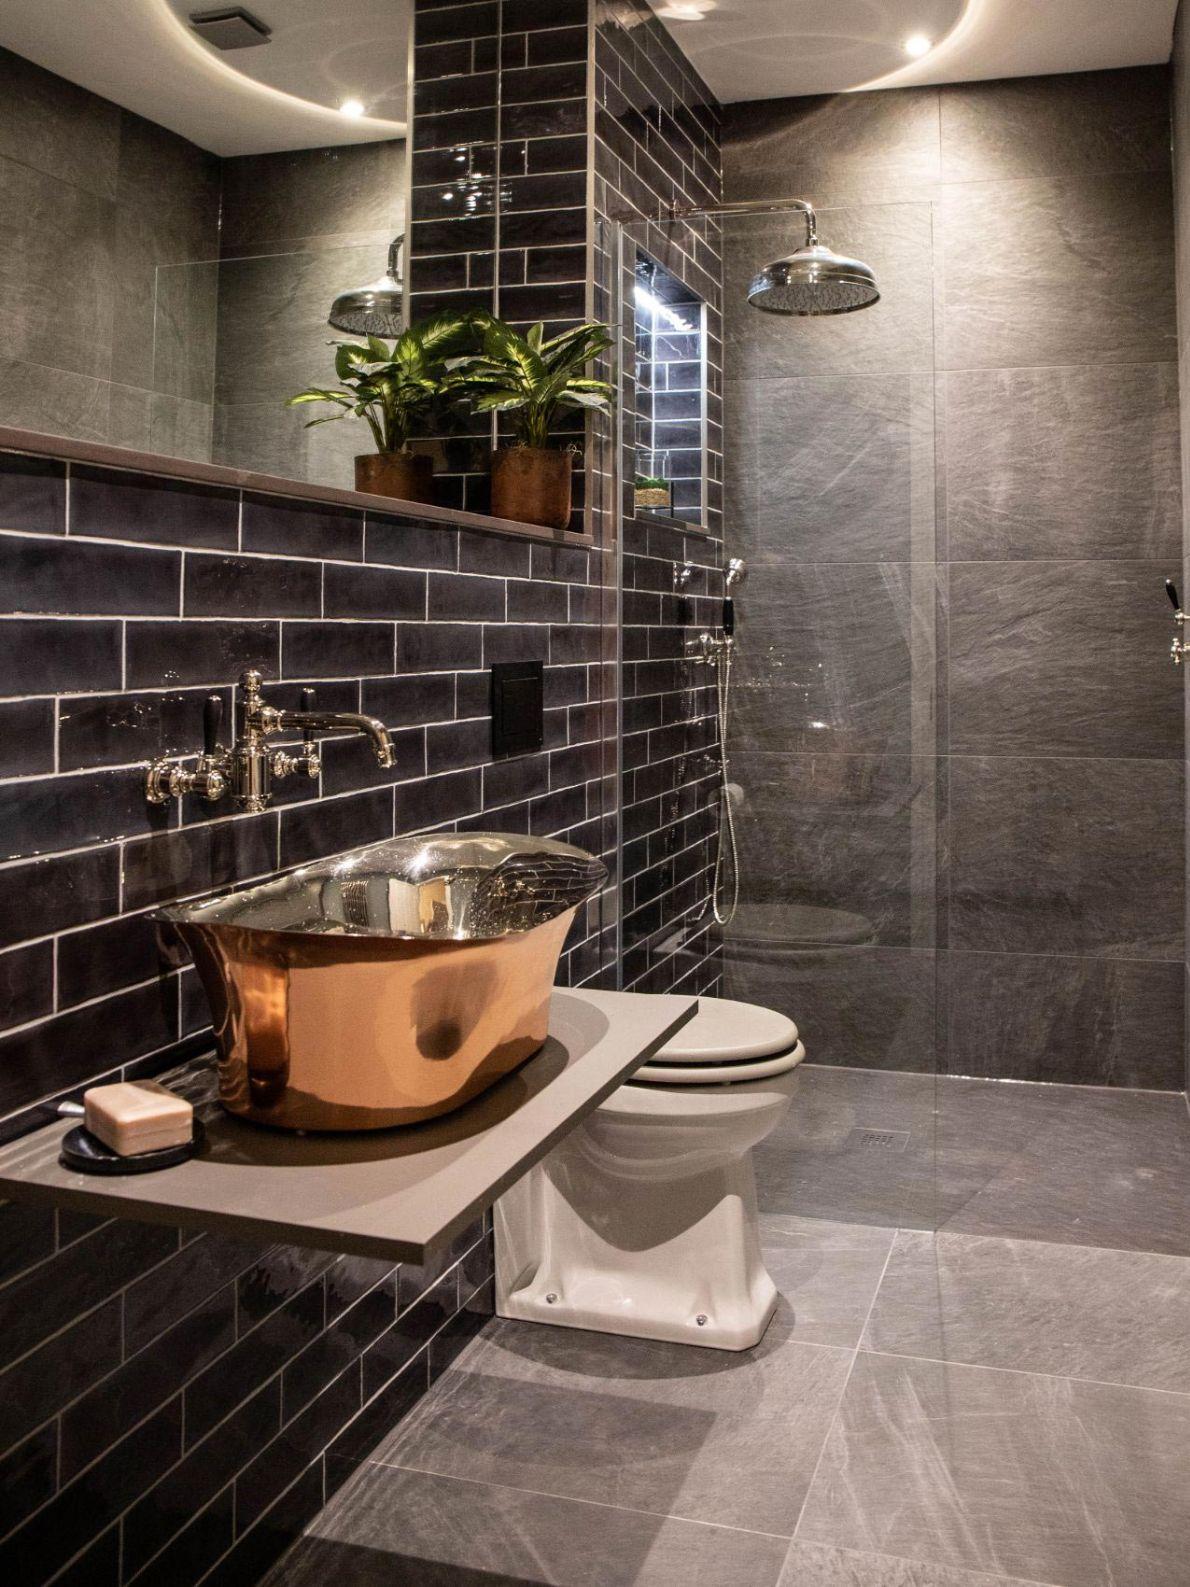 joes bathroom case study cover photo